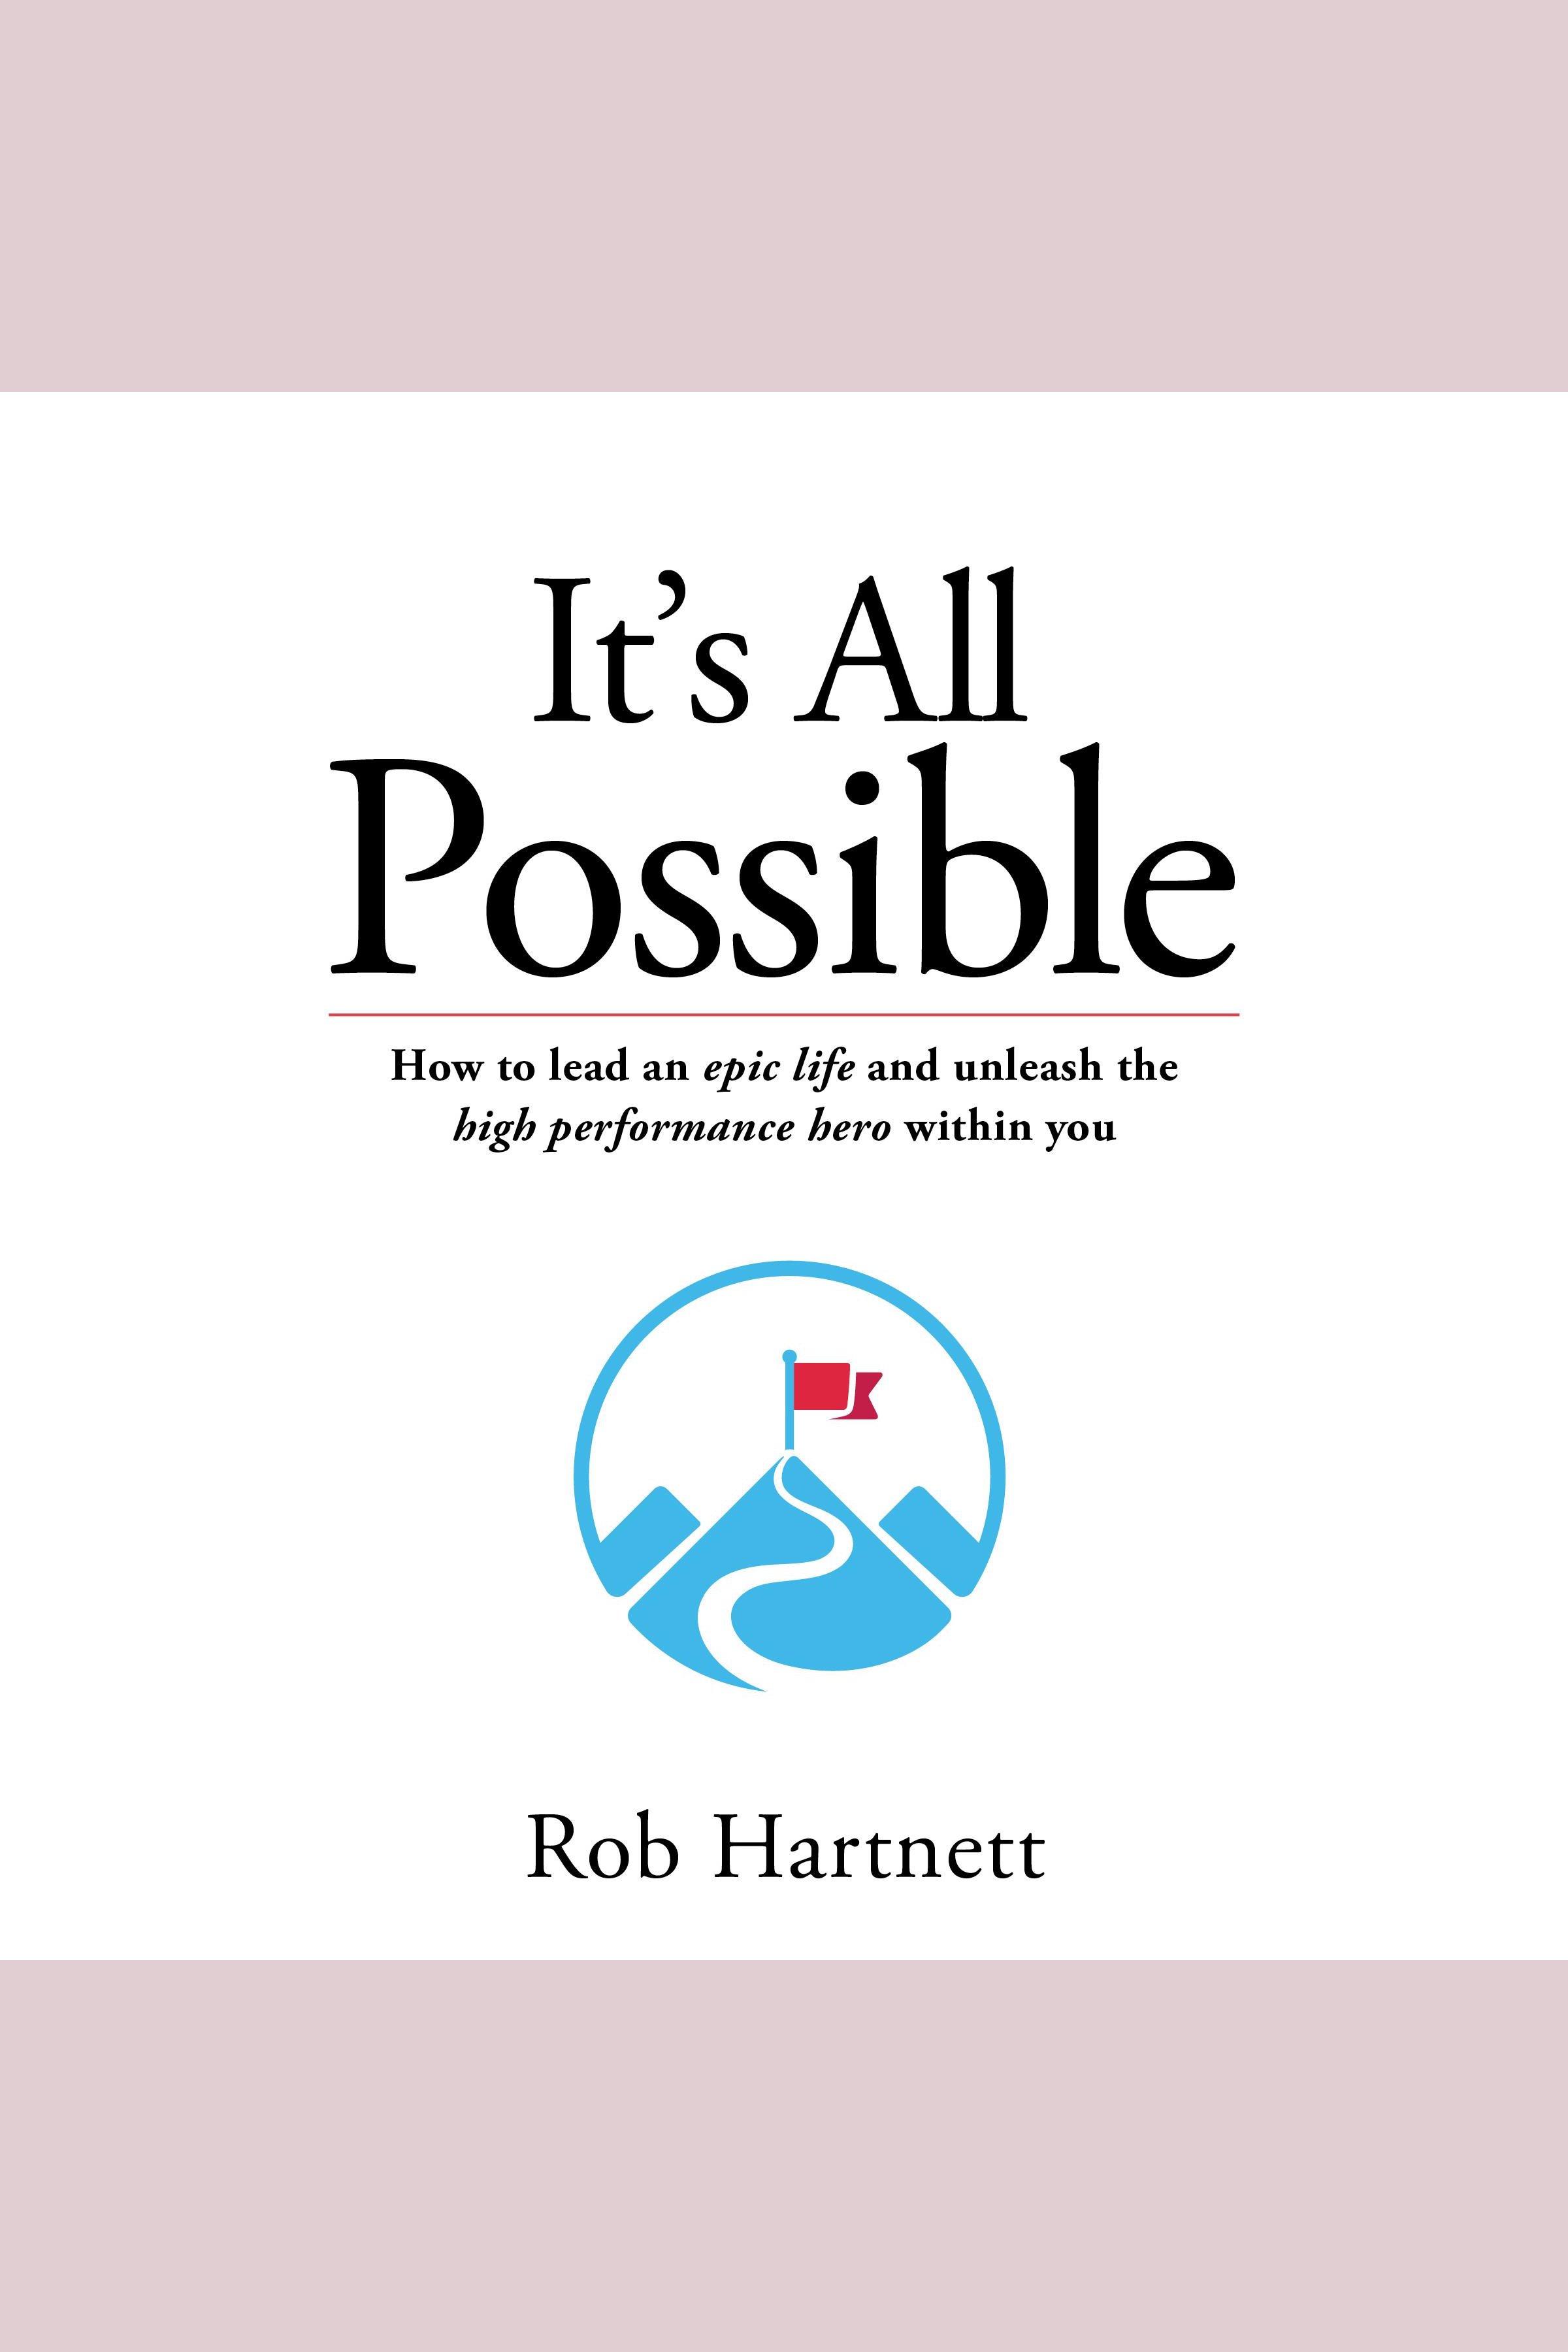 Esta es la portada del audiolibro It's All Possible